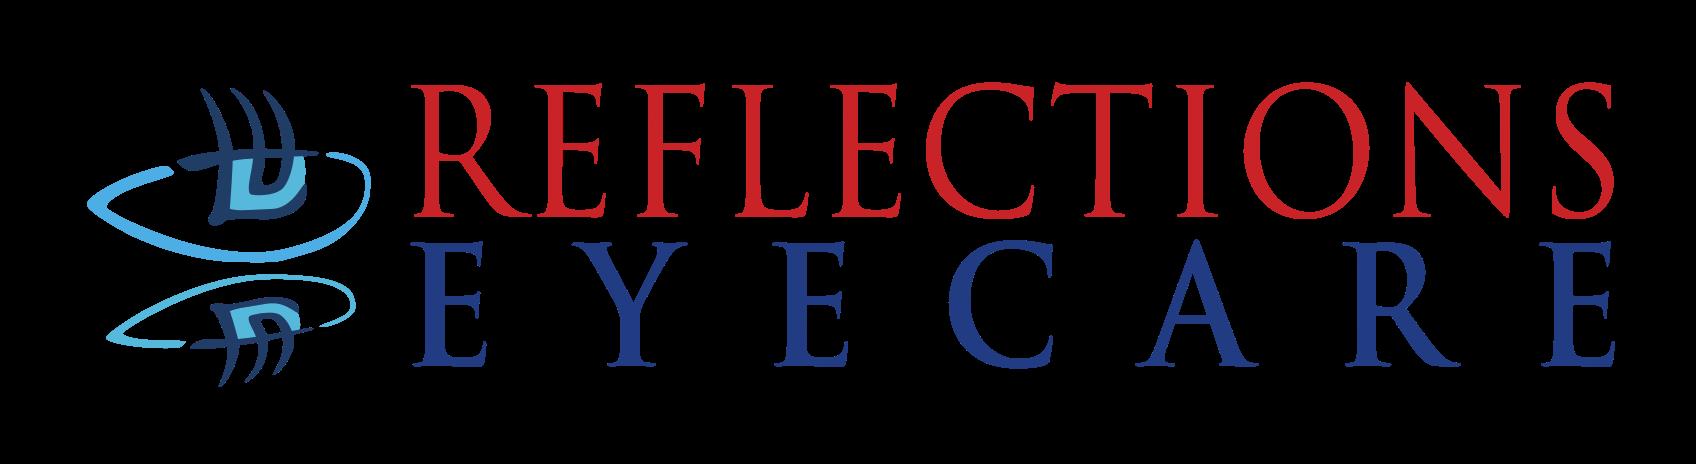 Reflections Eyecare